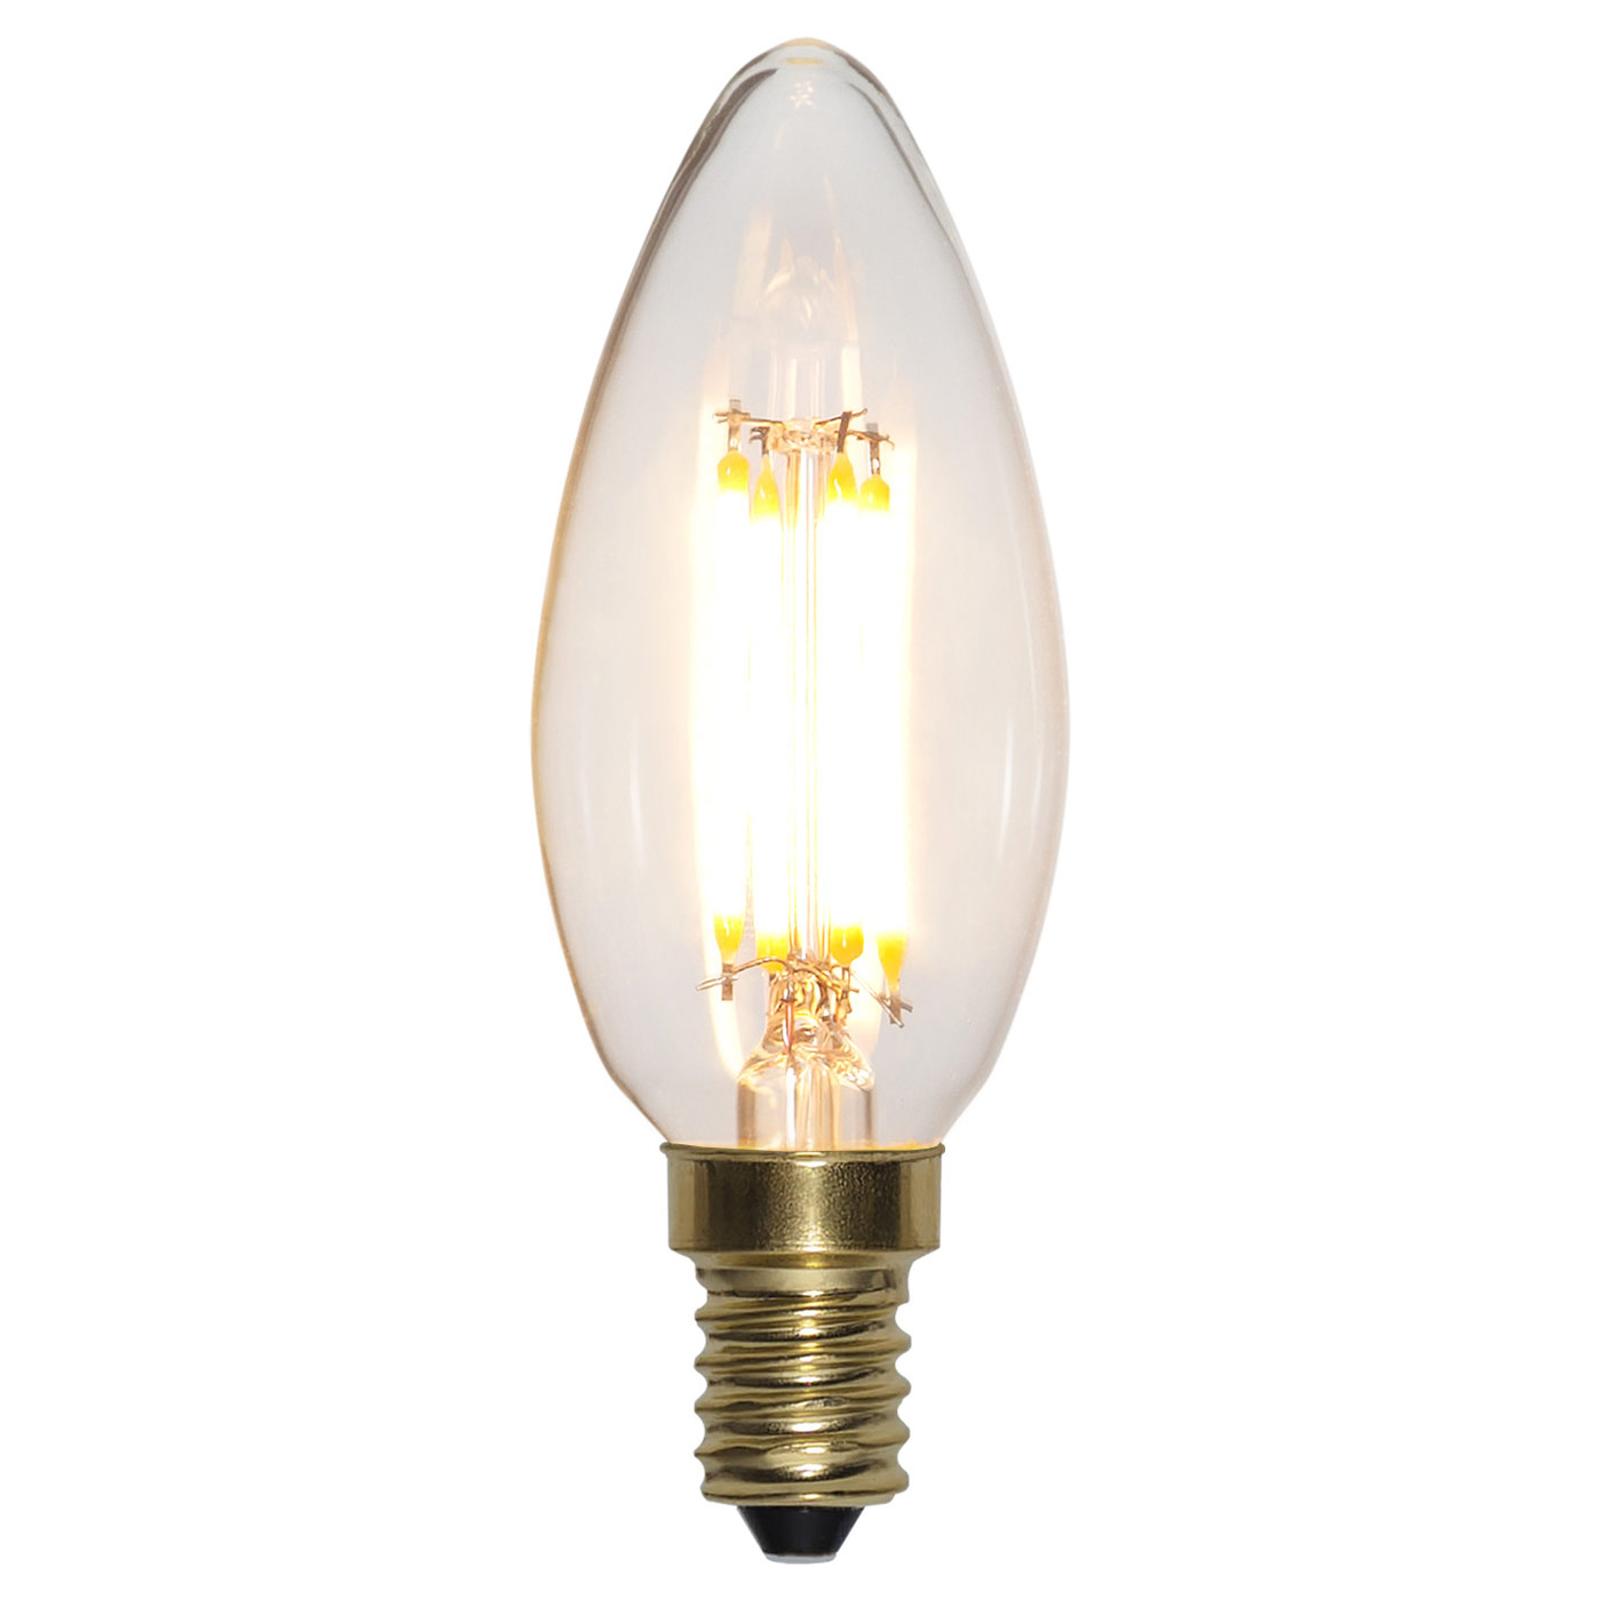 LED-pære E14 4W Soft Glow 2100 K 3-trinns dimming